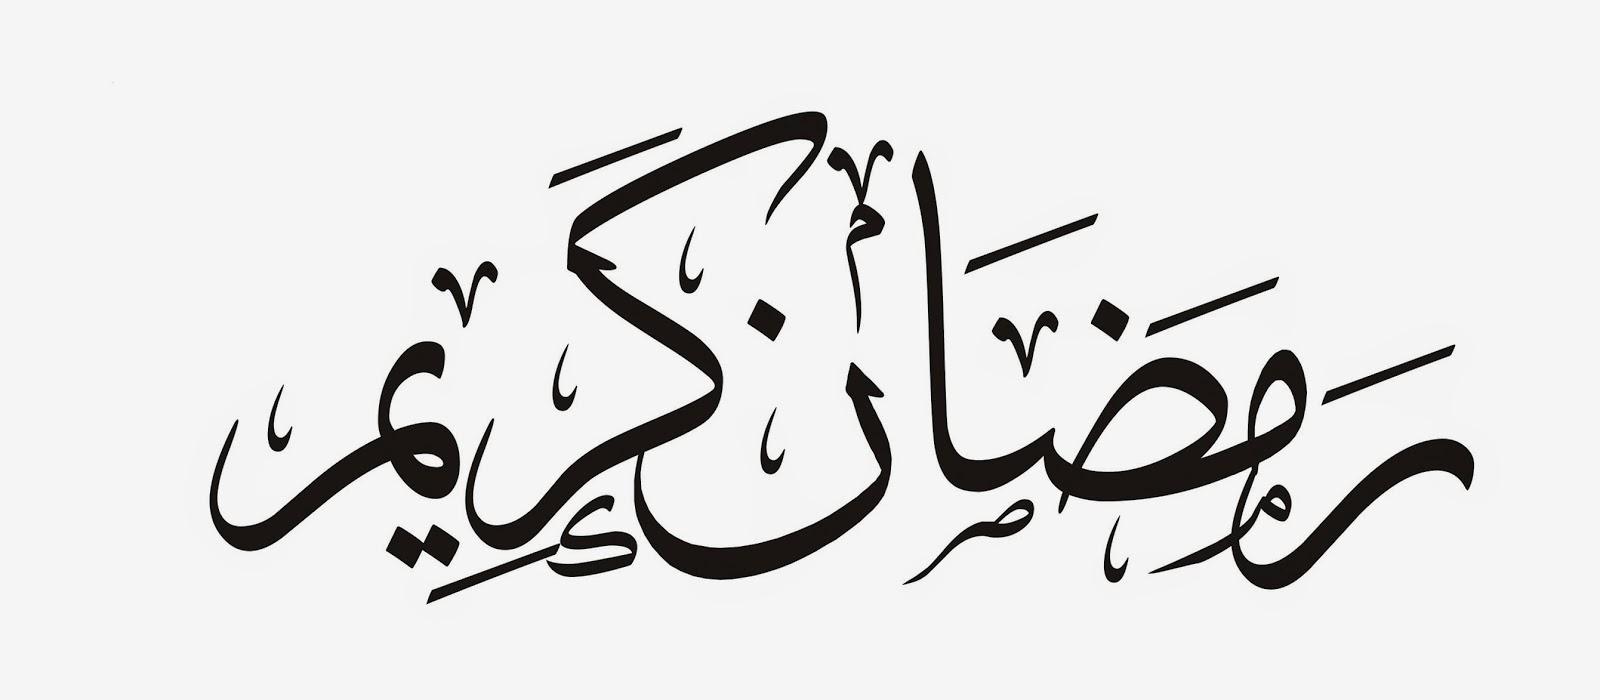 Ramadan HD PNG - 116697